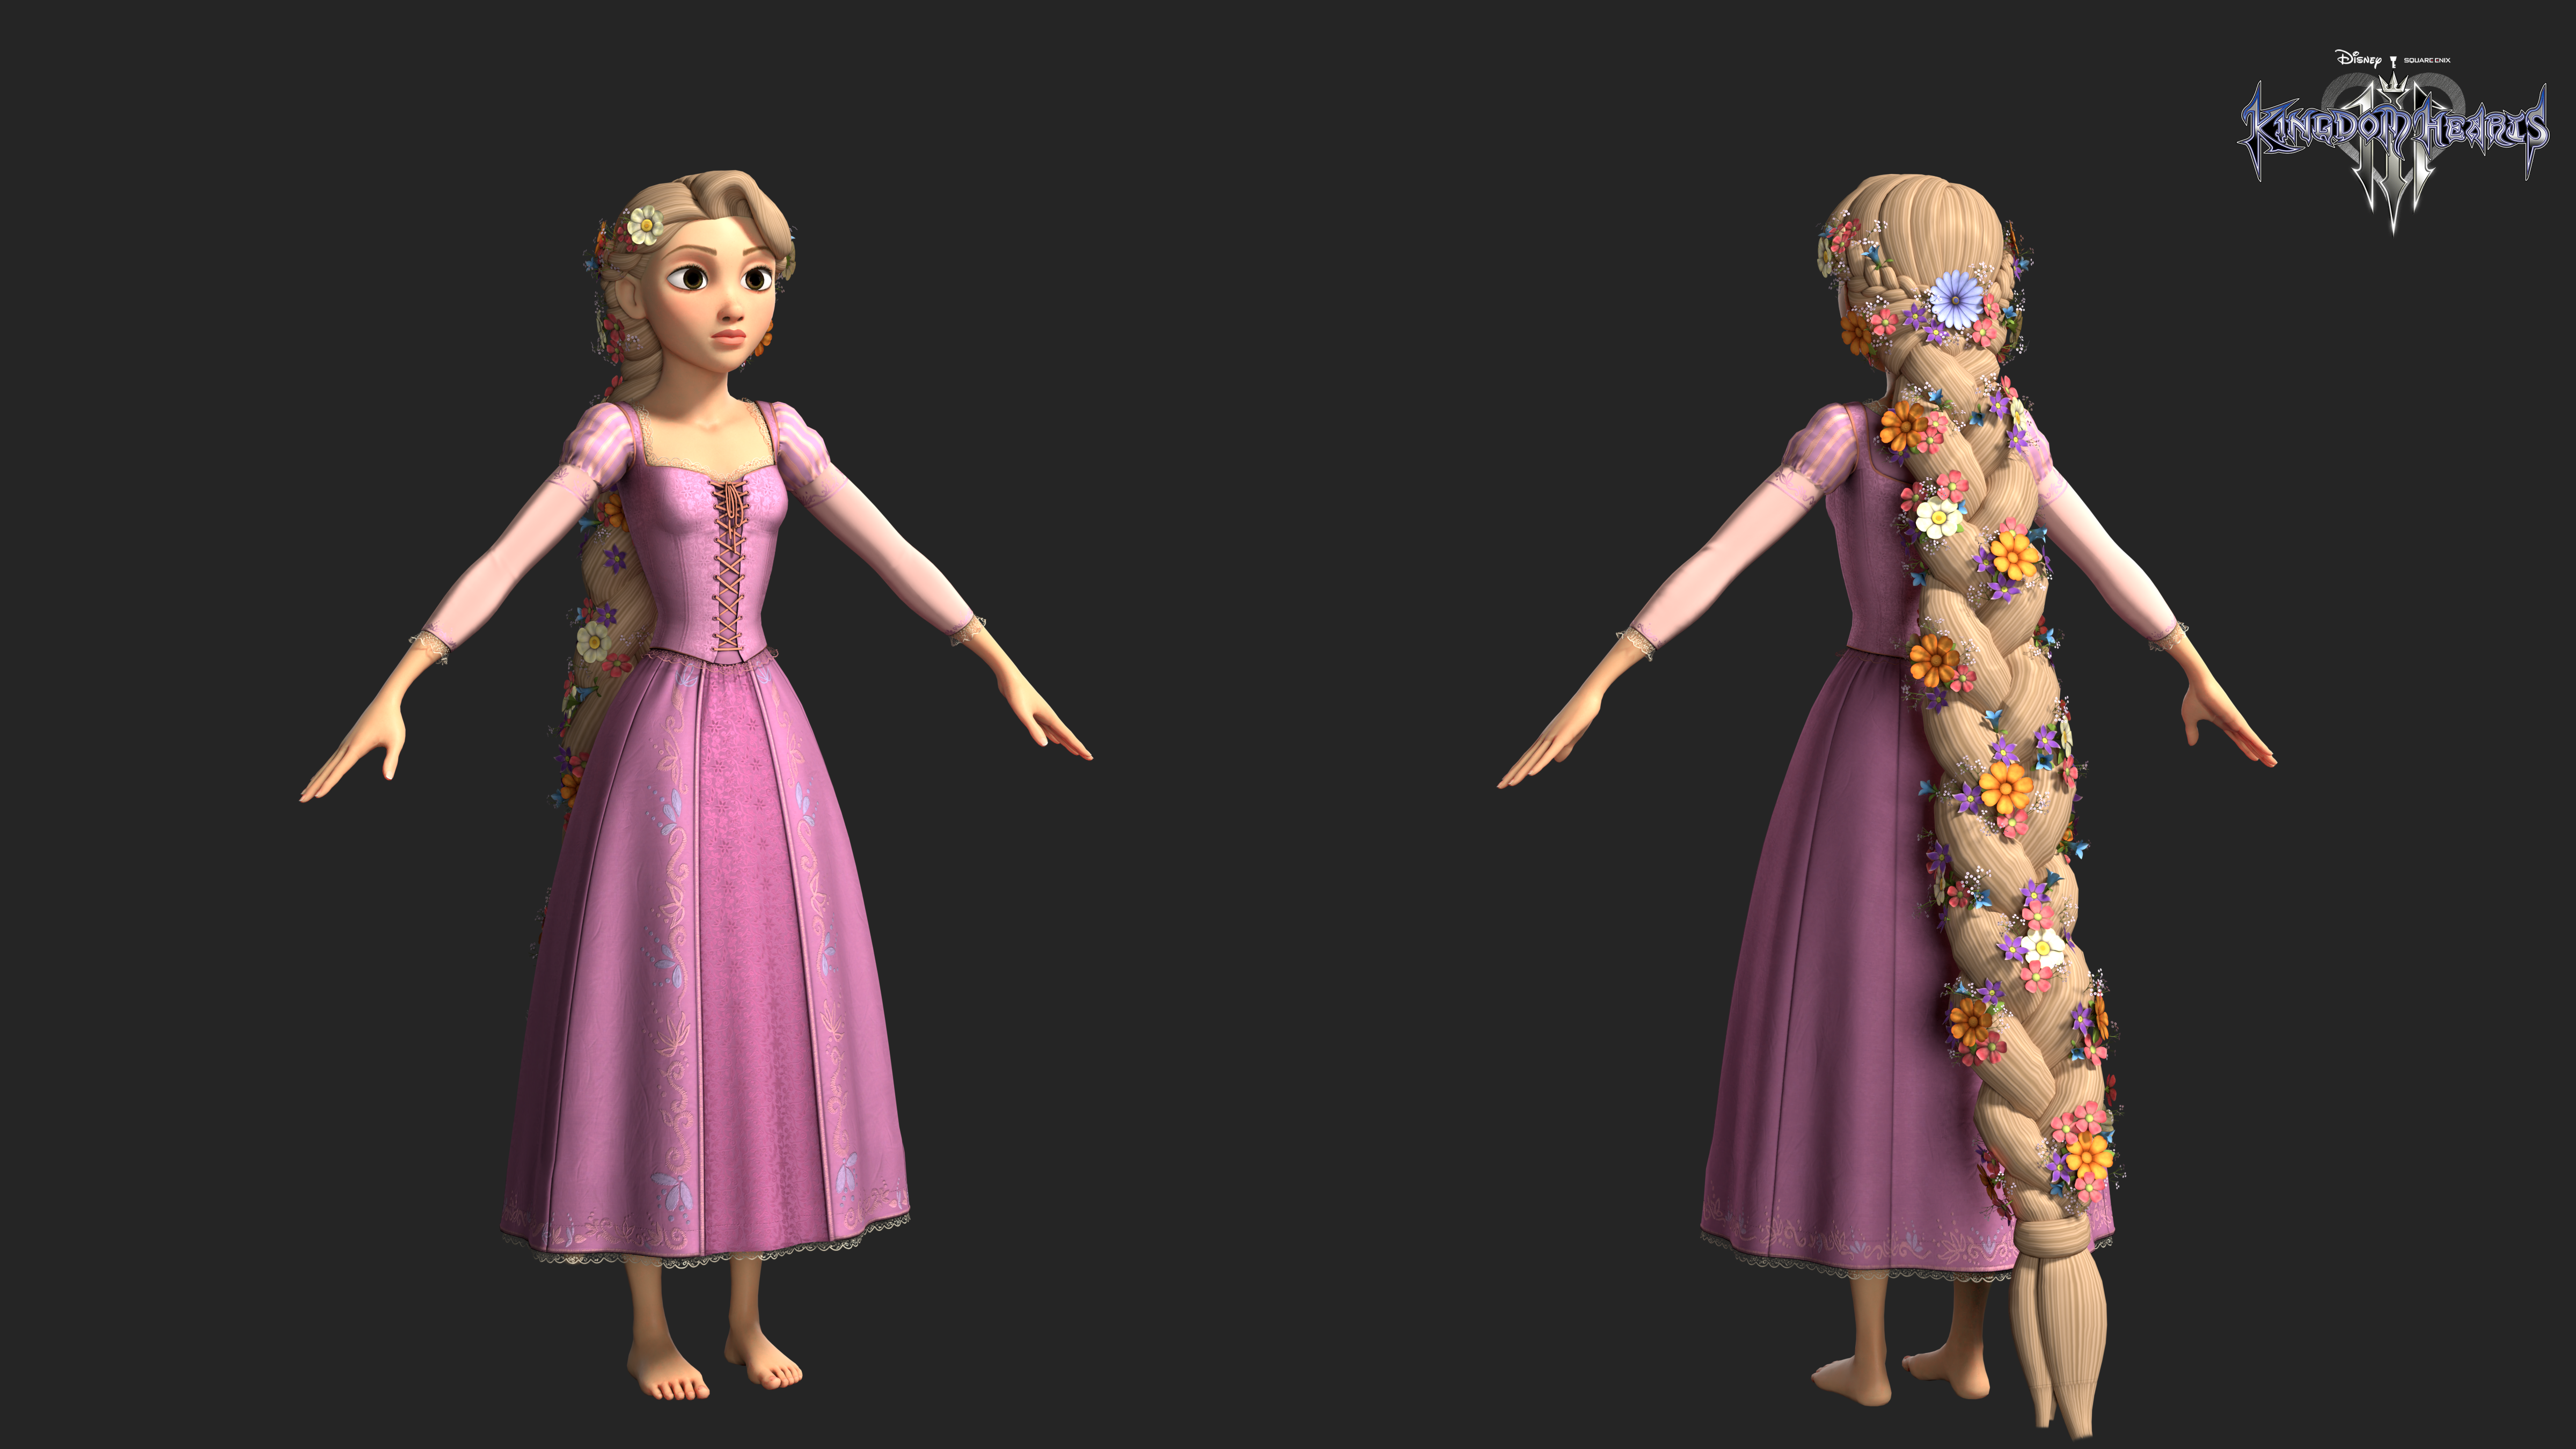 Kingdom Hearts 3 Rapunzel Braided Hair By Rotten Eyed On Deviantart